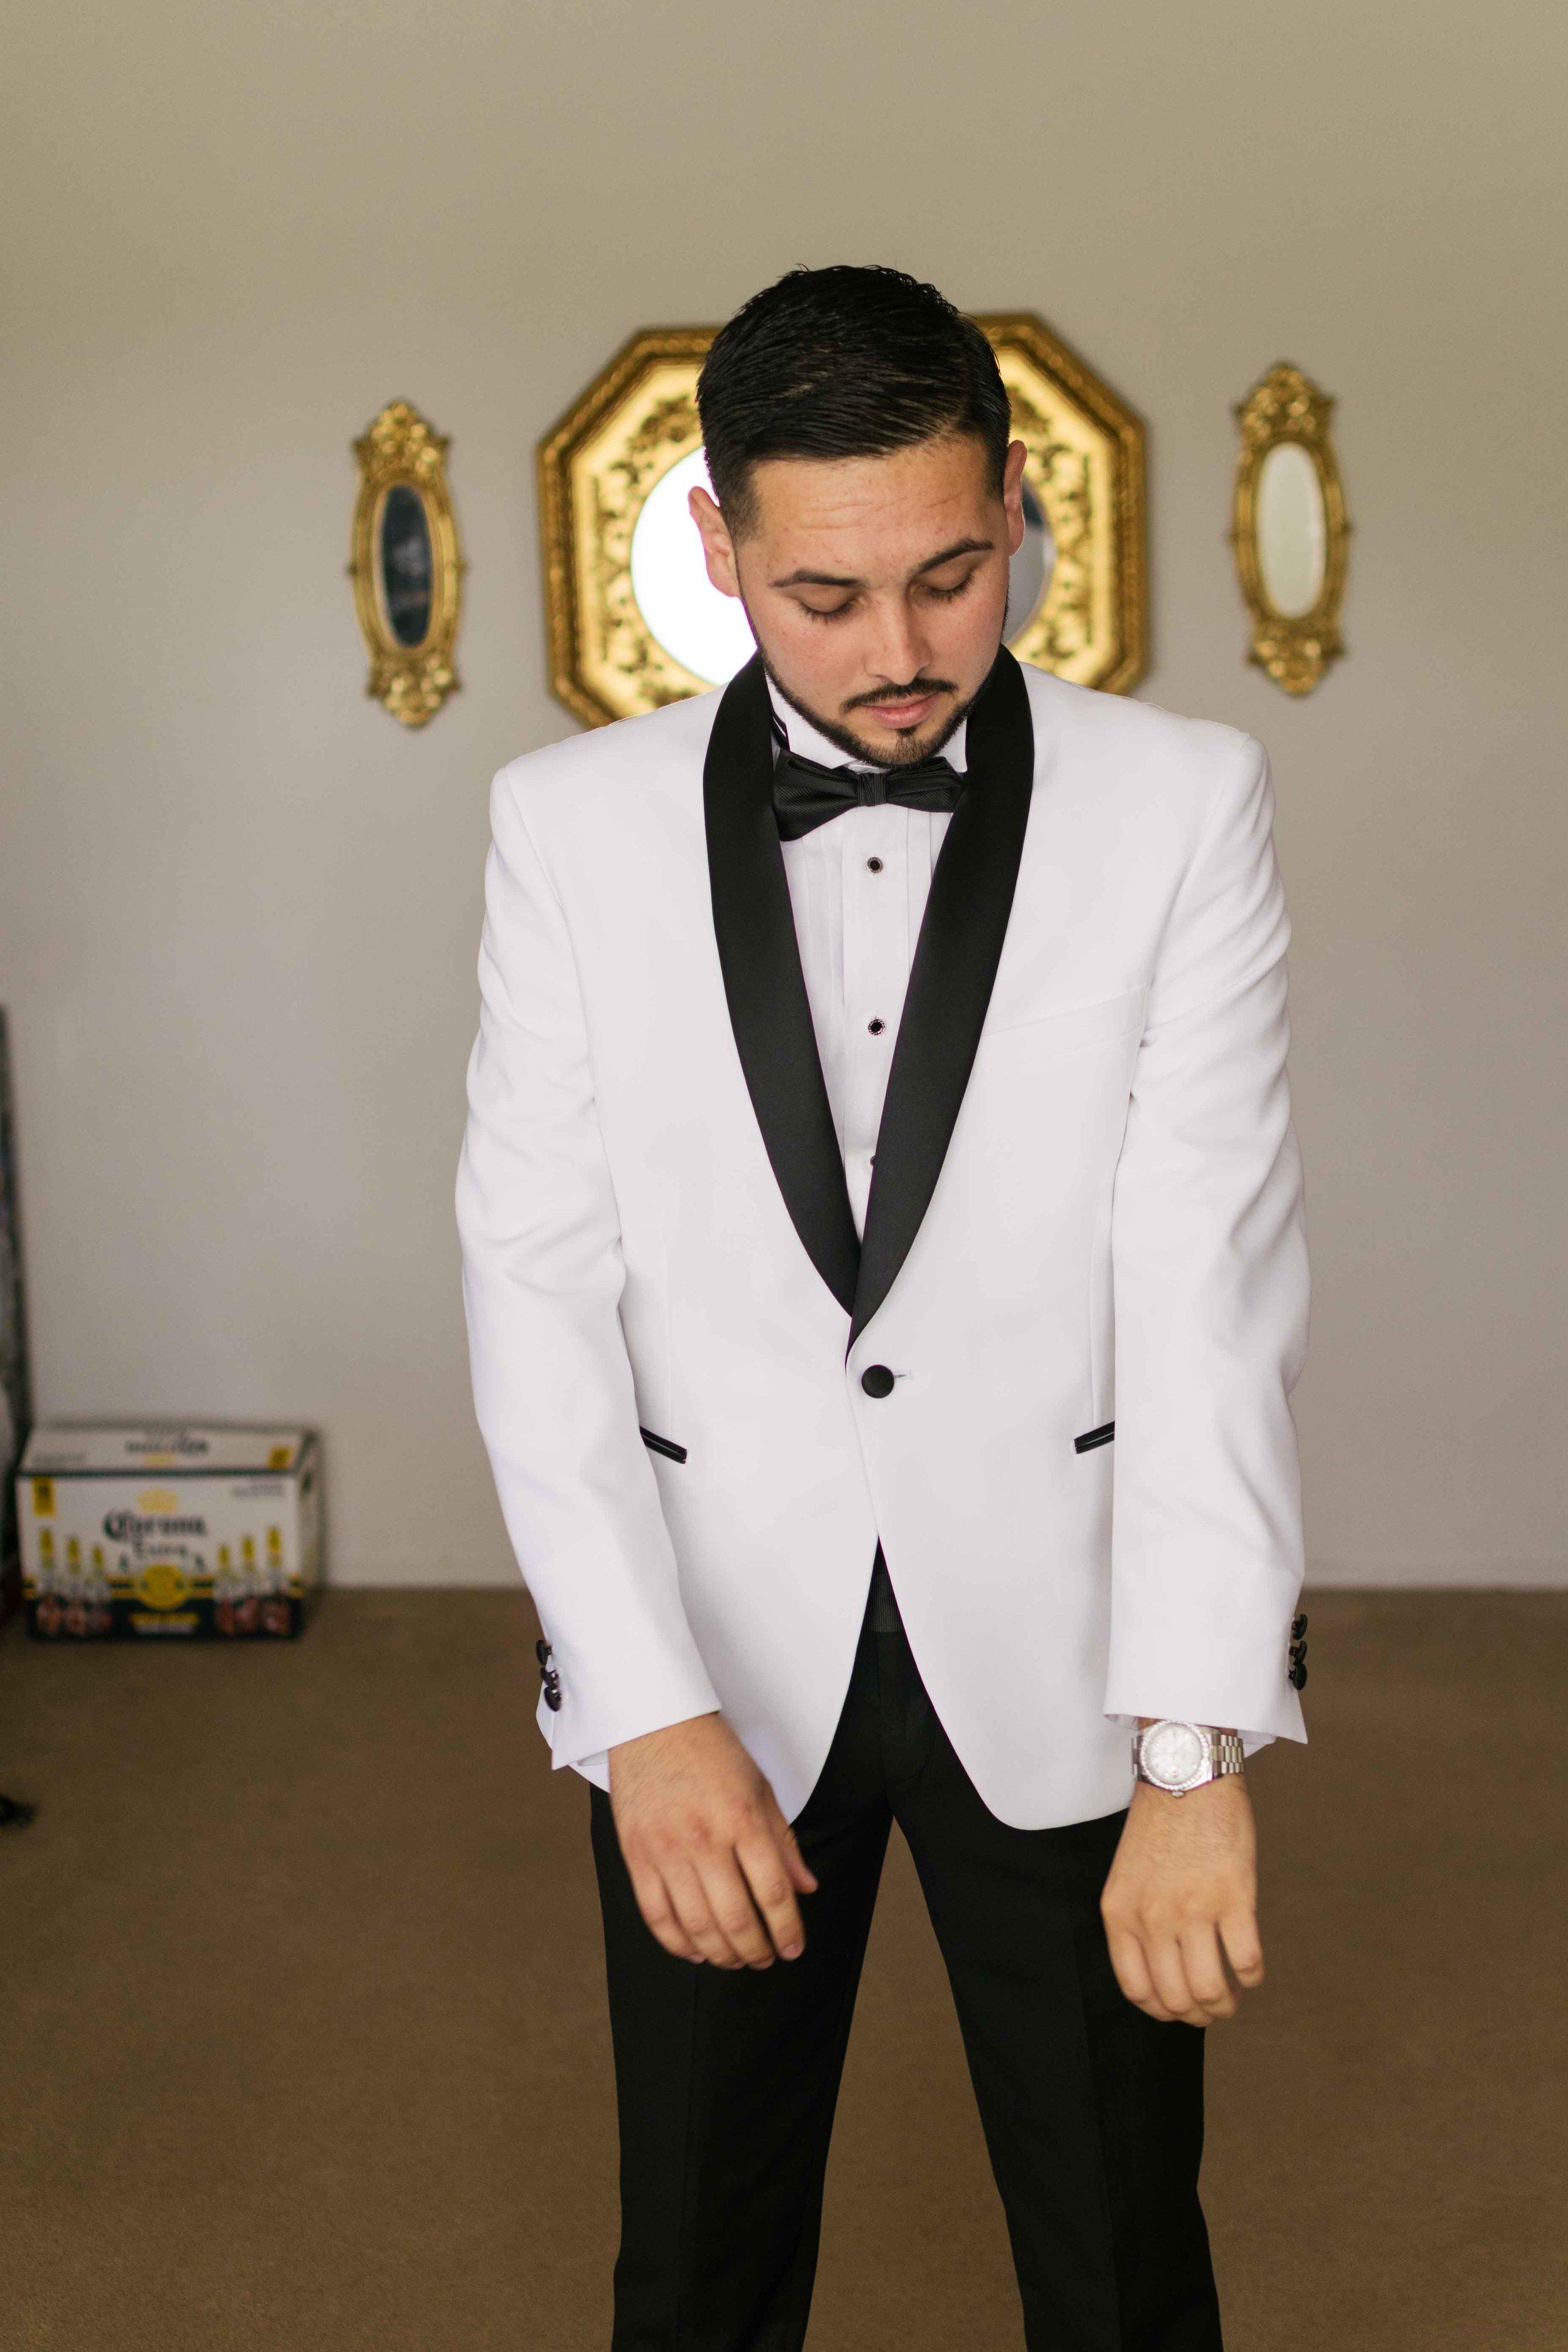 san-juan-bautista-photographer-tony-monse-wedding-59.JPG